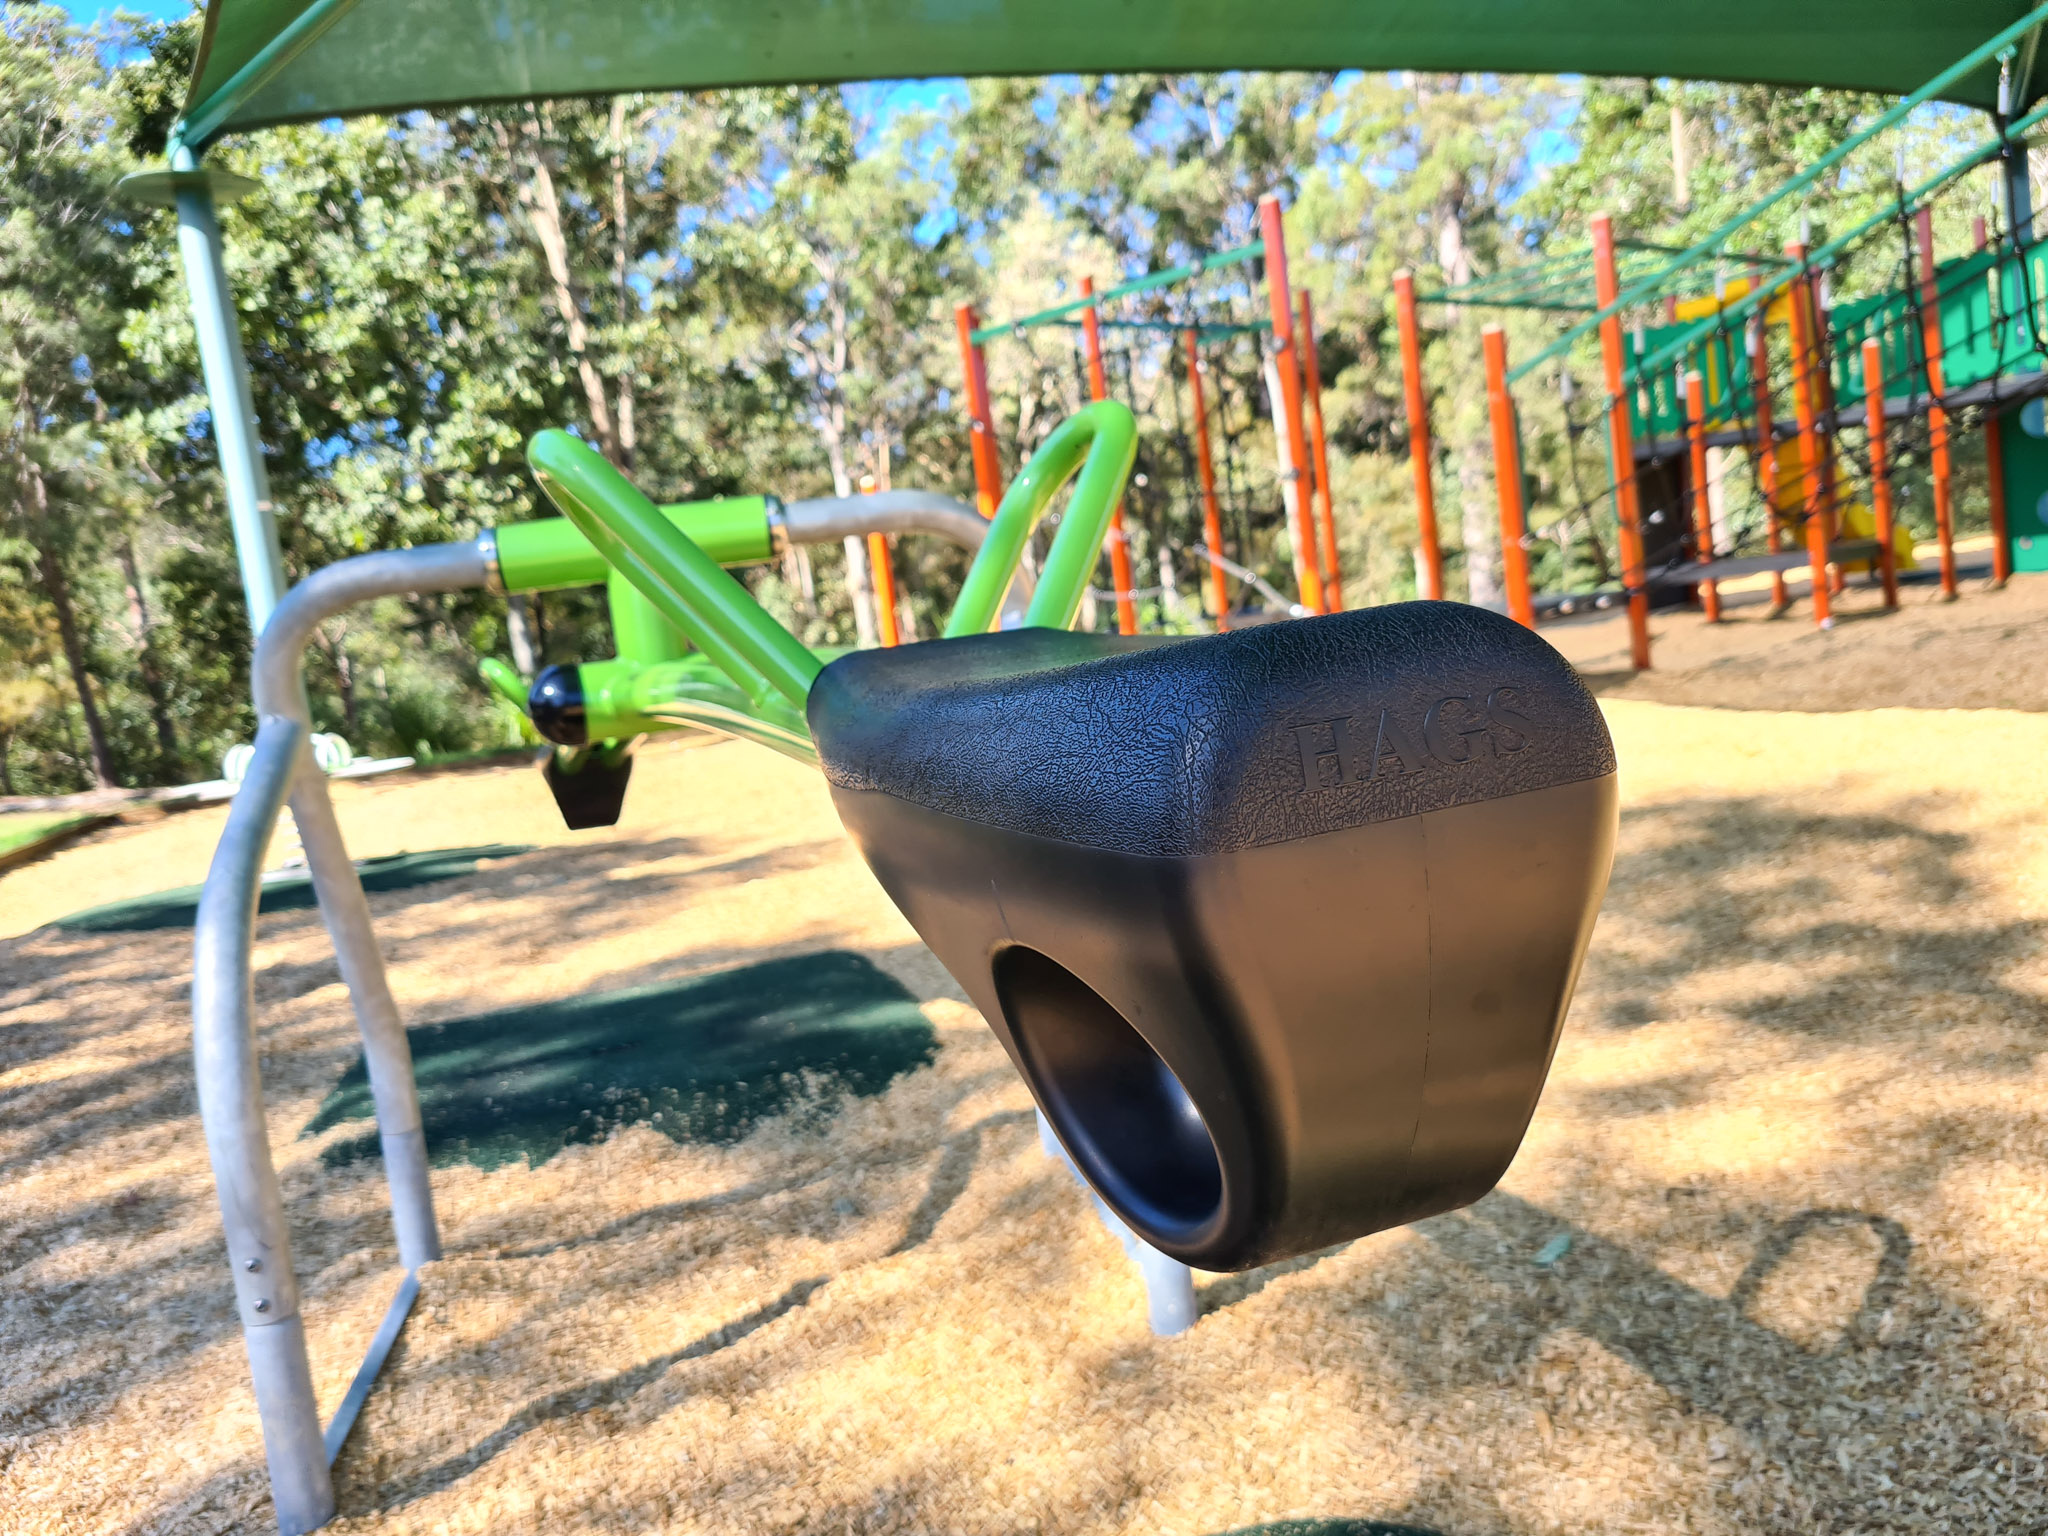 palm-beach-state-school-playrground-austek-play-49